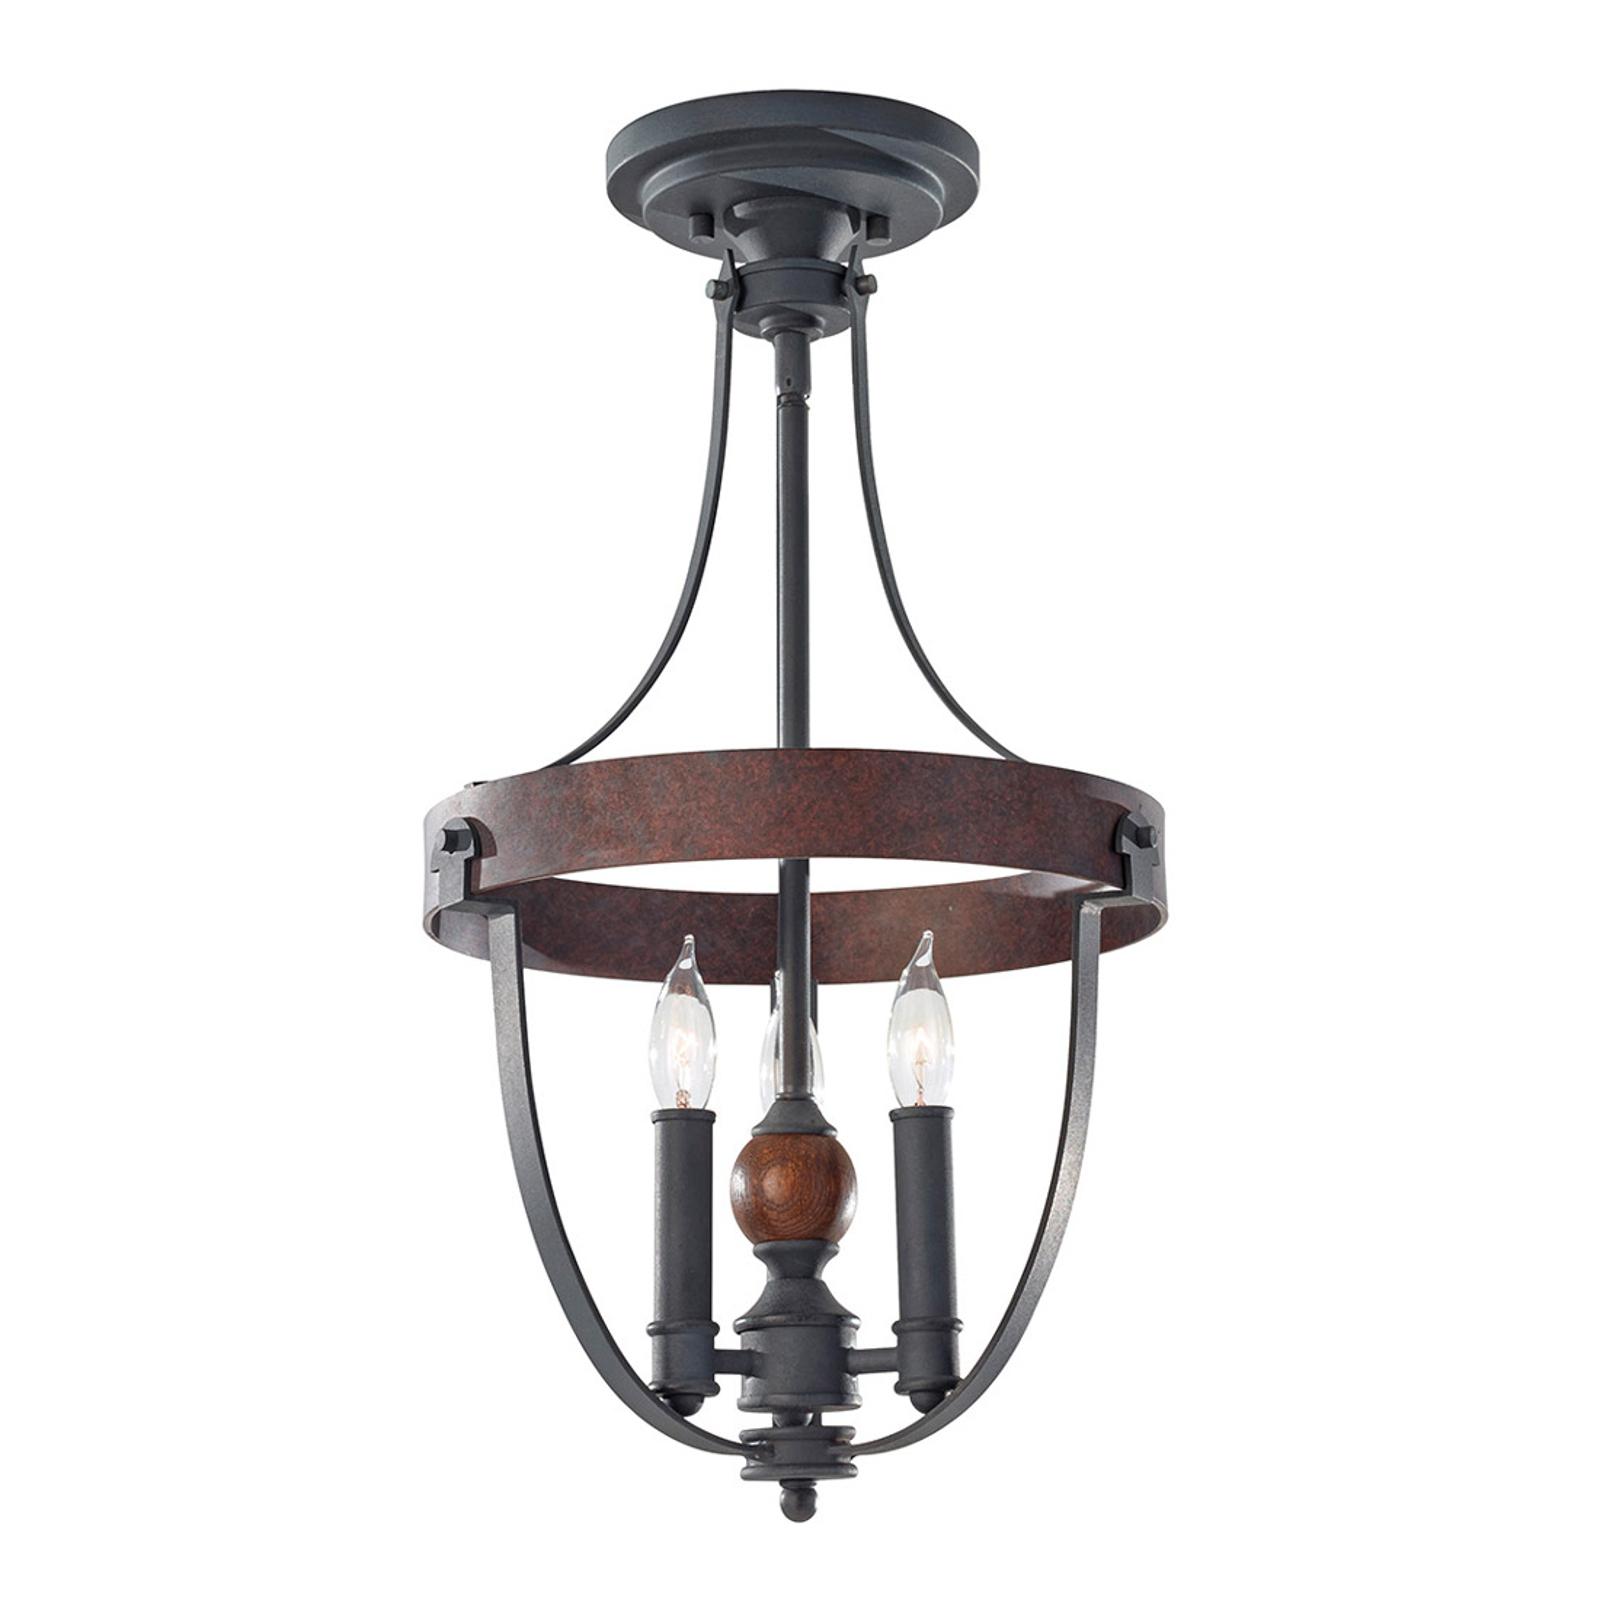 Lampa sufitowa w stylu country Alston